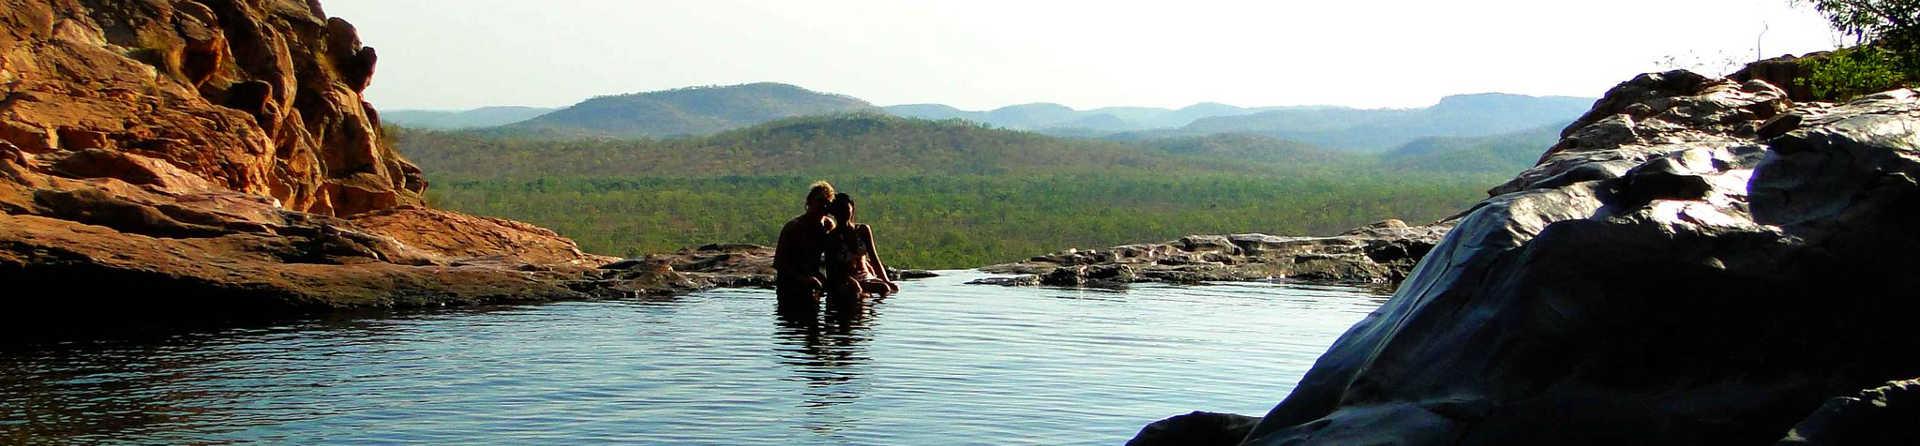 Where can you swim in Kakadu?